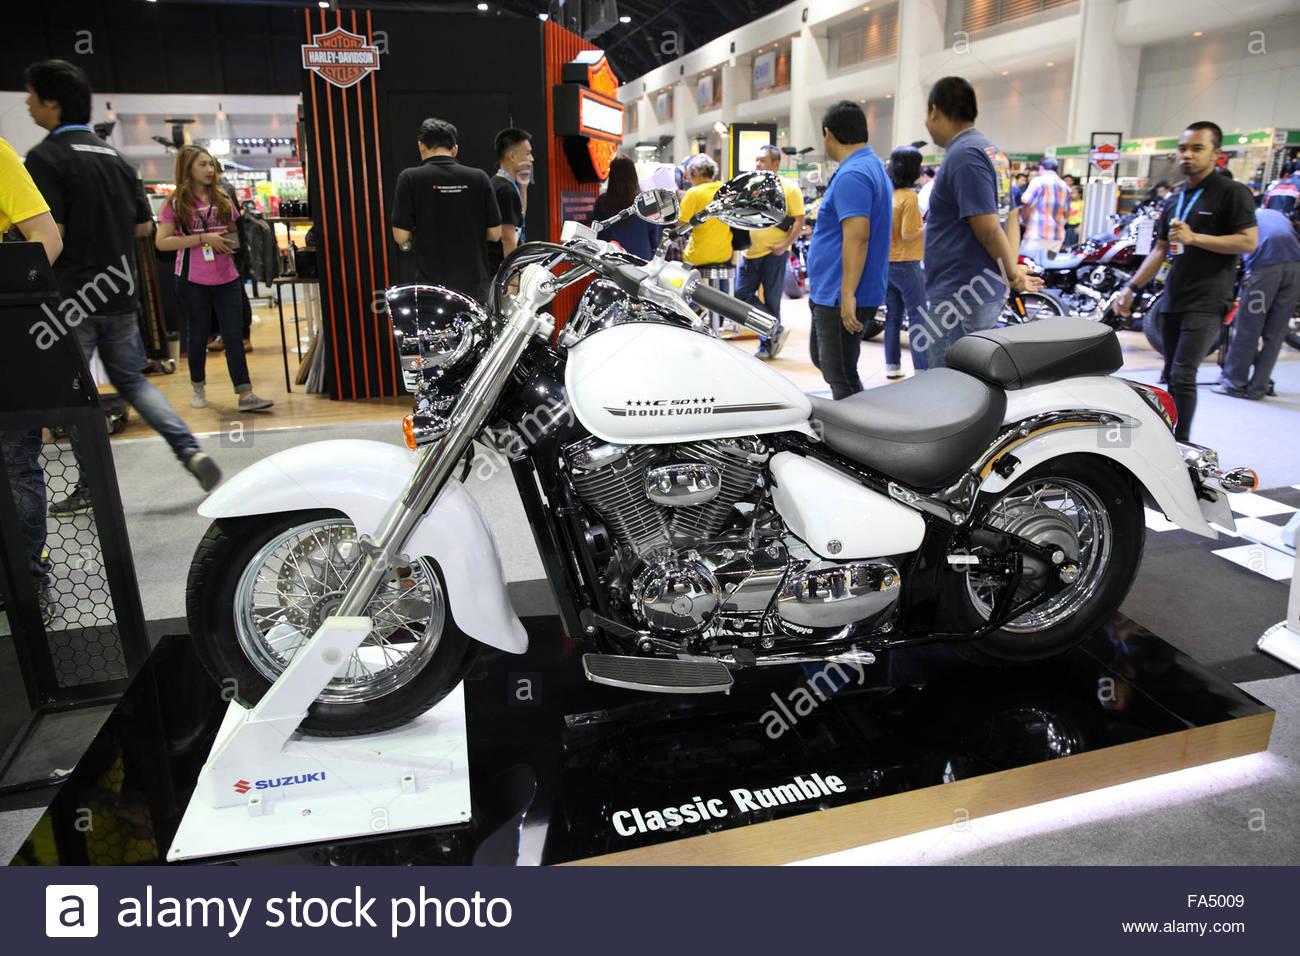 BANGKOK - December 11 : Suzuki Classic Rumble motorcycle on display at The Motor Expo 2015 on December 11, 2015 Stock Photo